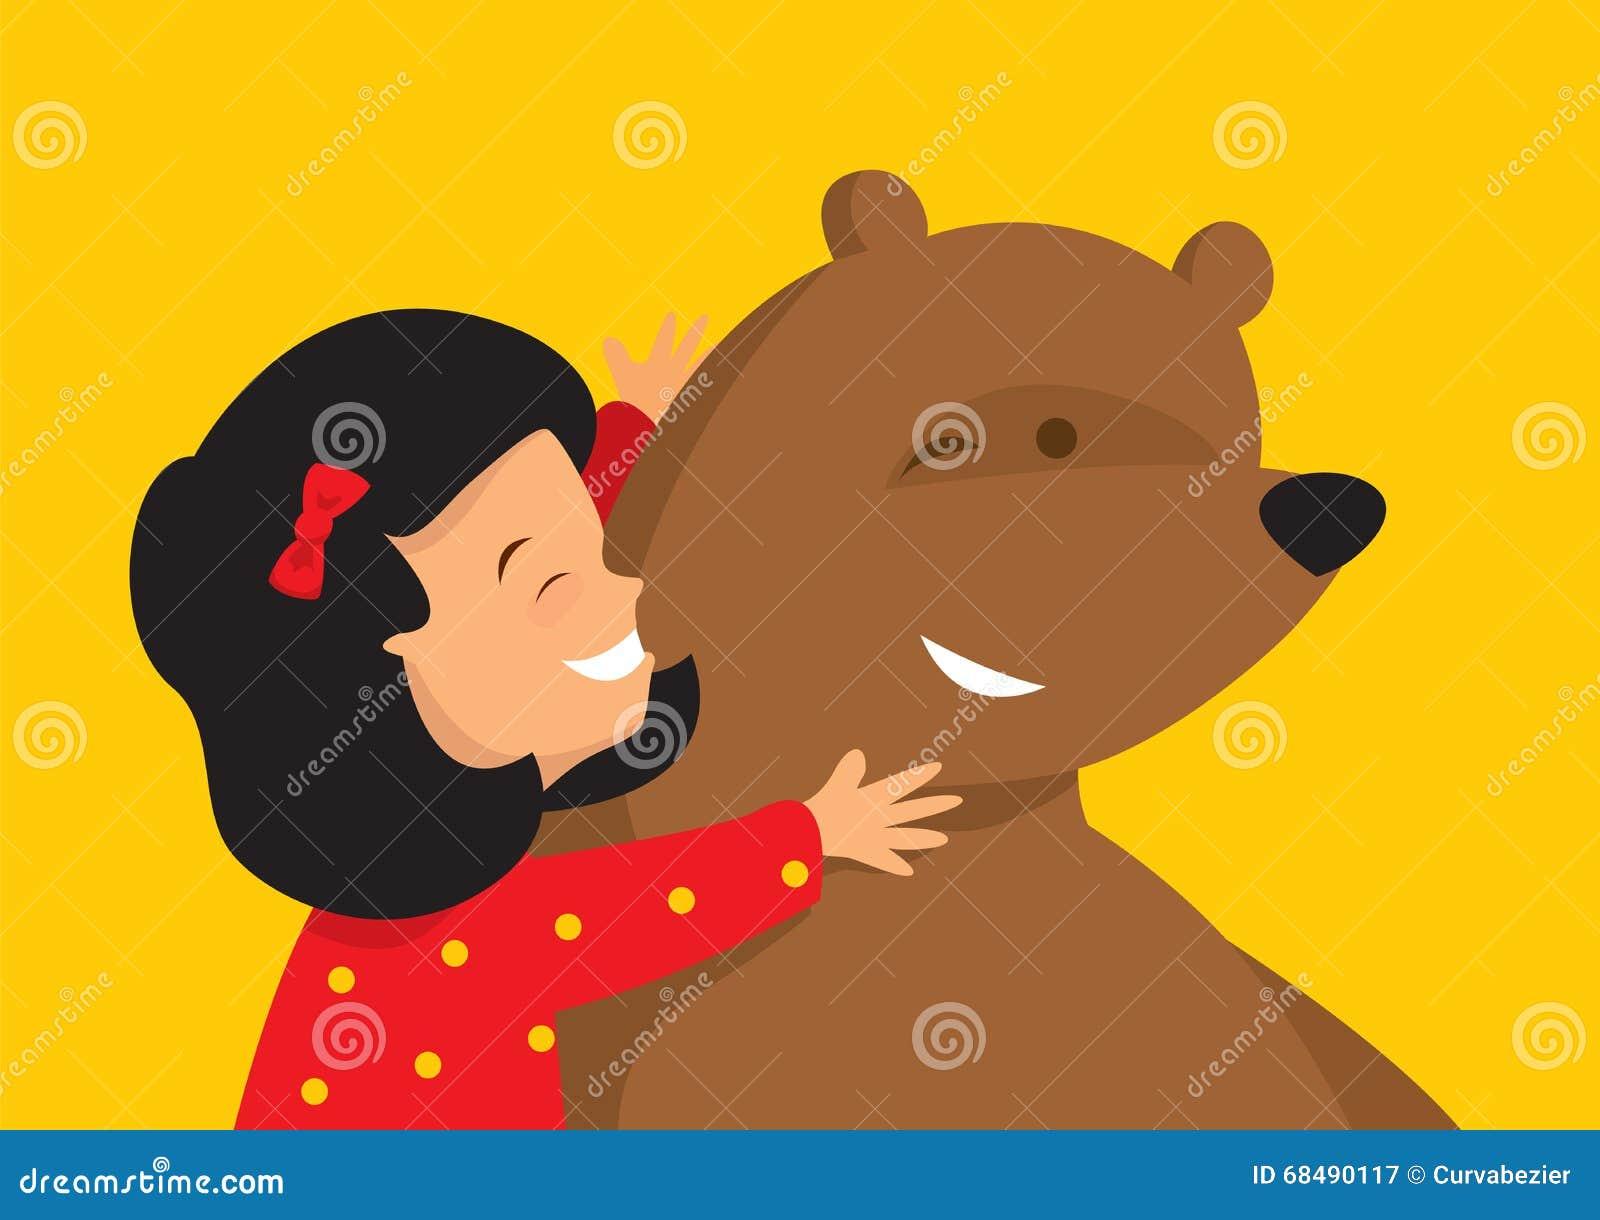 Masha and the Bear (Russian: Ма́ша и Медве́дь, translit. Masha i Medved Russian pronunciation: [ˈmaʂə i mʲɪdˈvetʲ]) is a Russian animated.